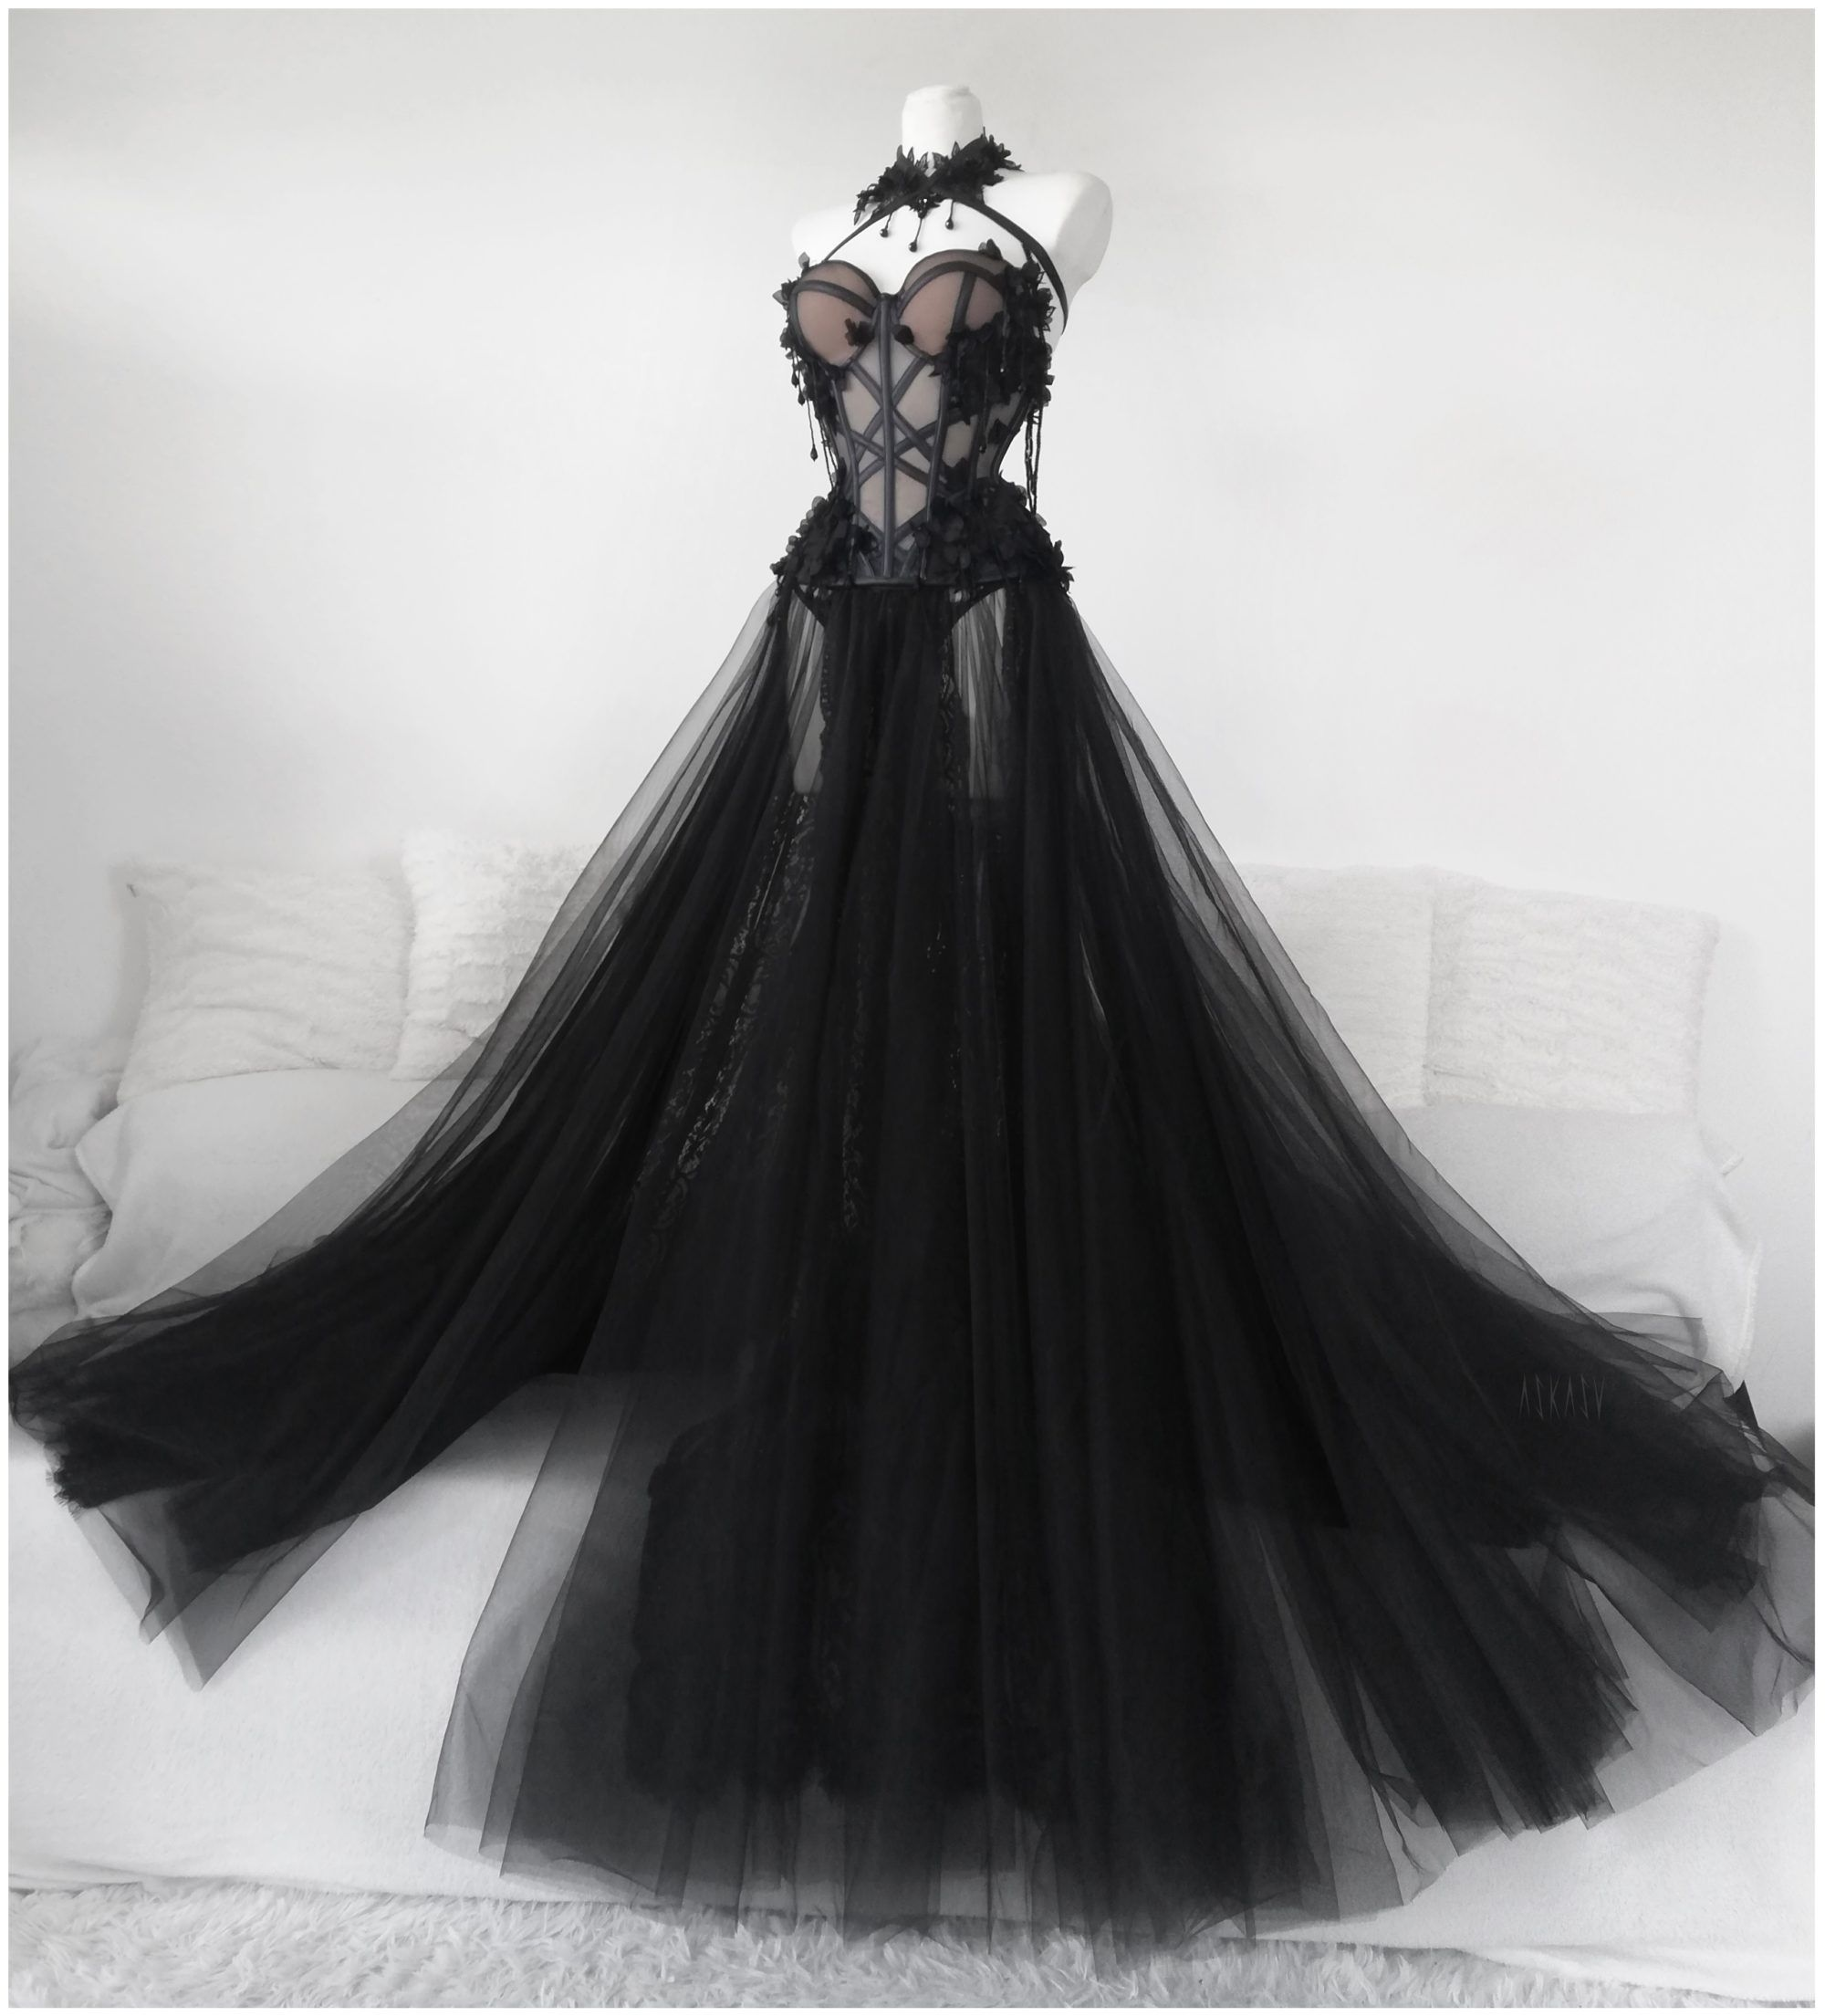 Lithium Fume Corset Gown Askasu Fairytale Dress Ball Dresses Fantasy Gowns [ 2209 x 2000 Pixel ]